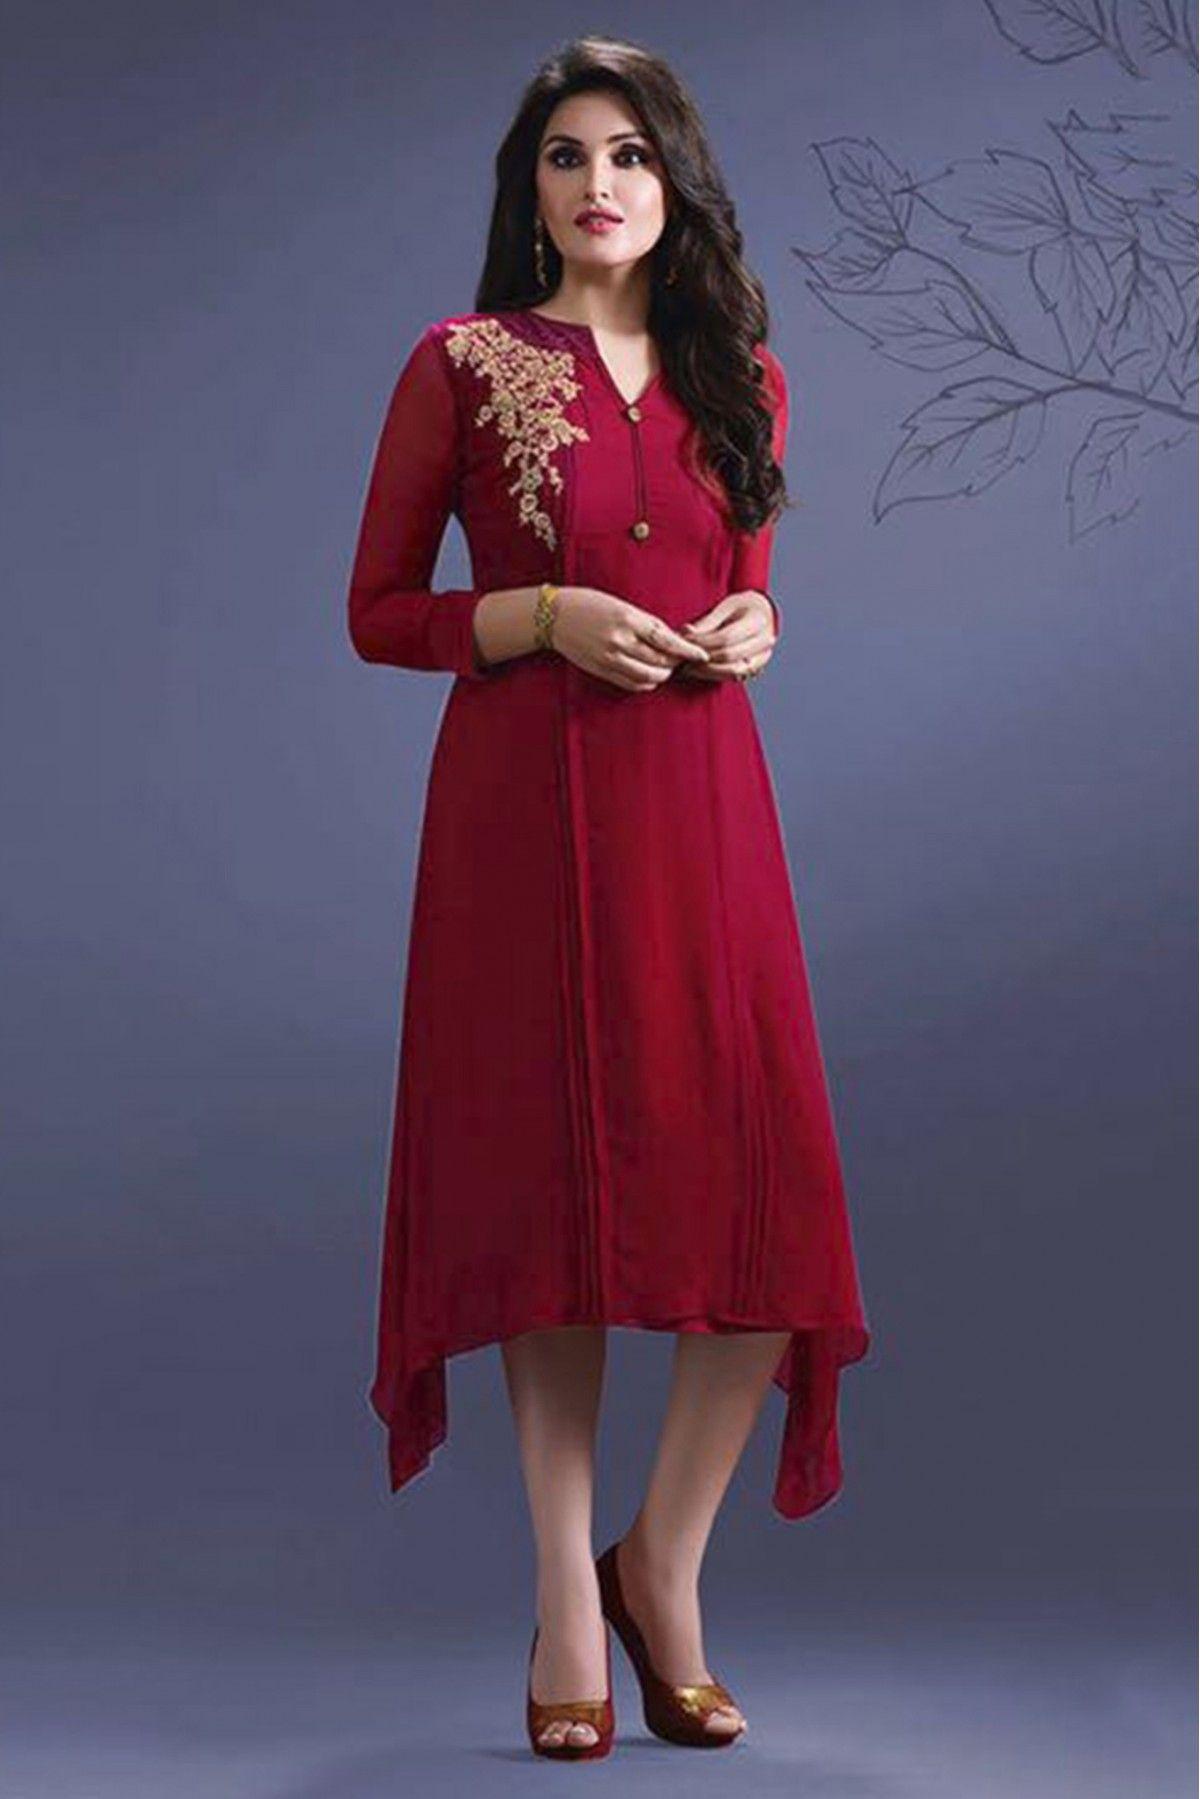 5ee0b94aee2f Georgette Party Wear Kurti In Red Colour in 2019 | Latest Party Wear Kurtis  Online | Kurti, Indian designer wear, Embroidered kurti